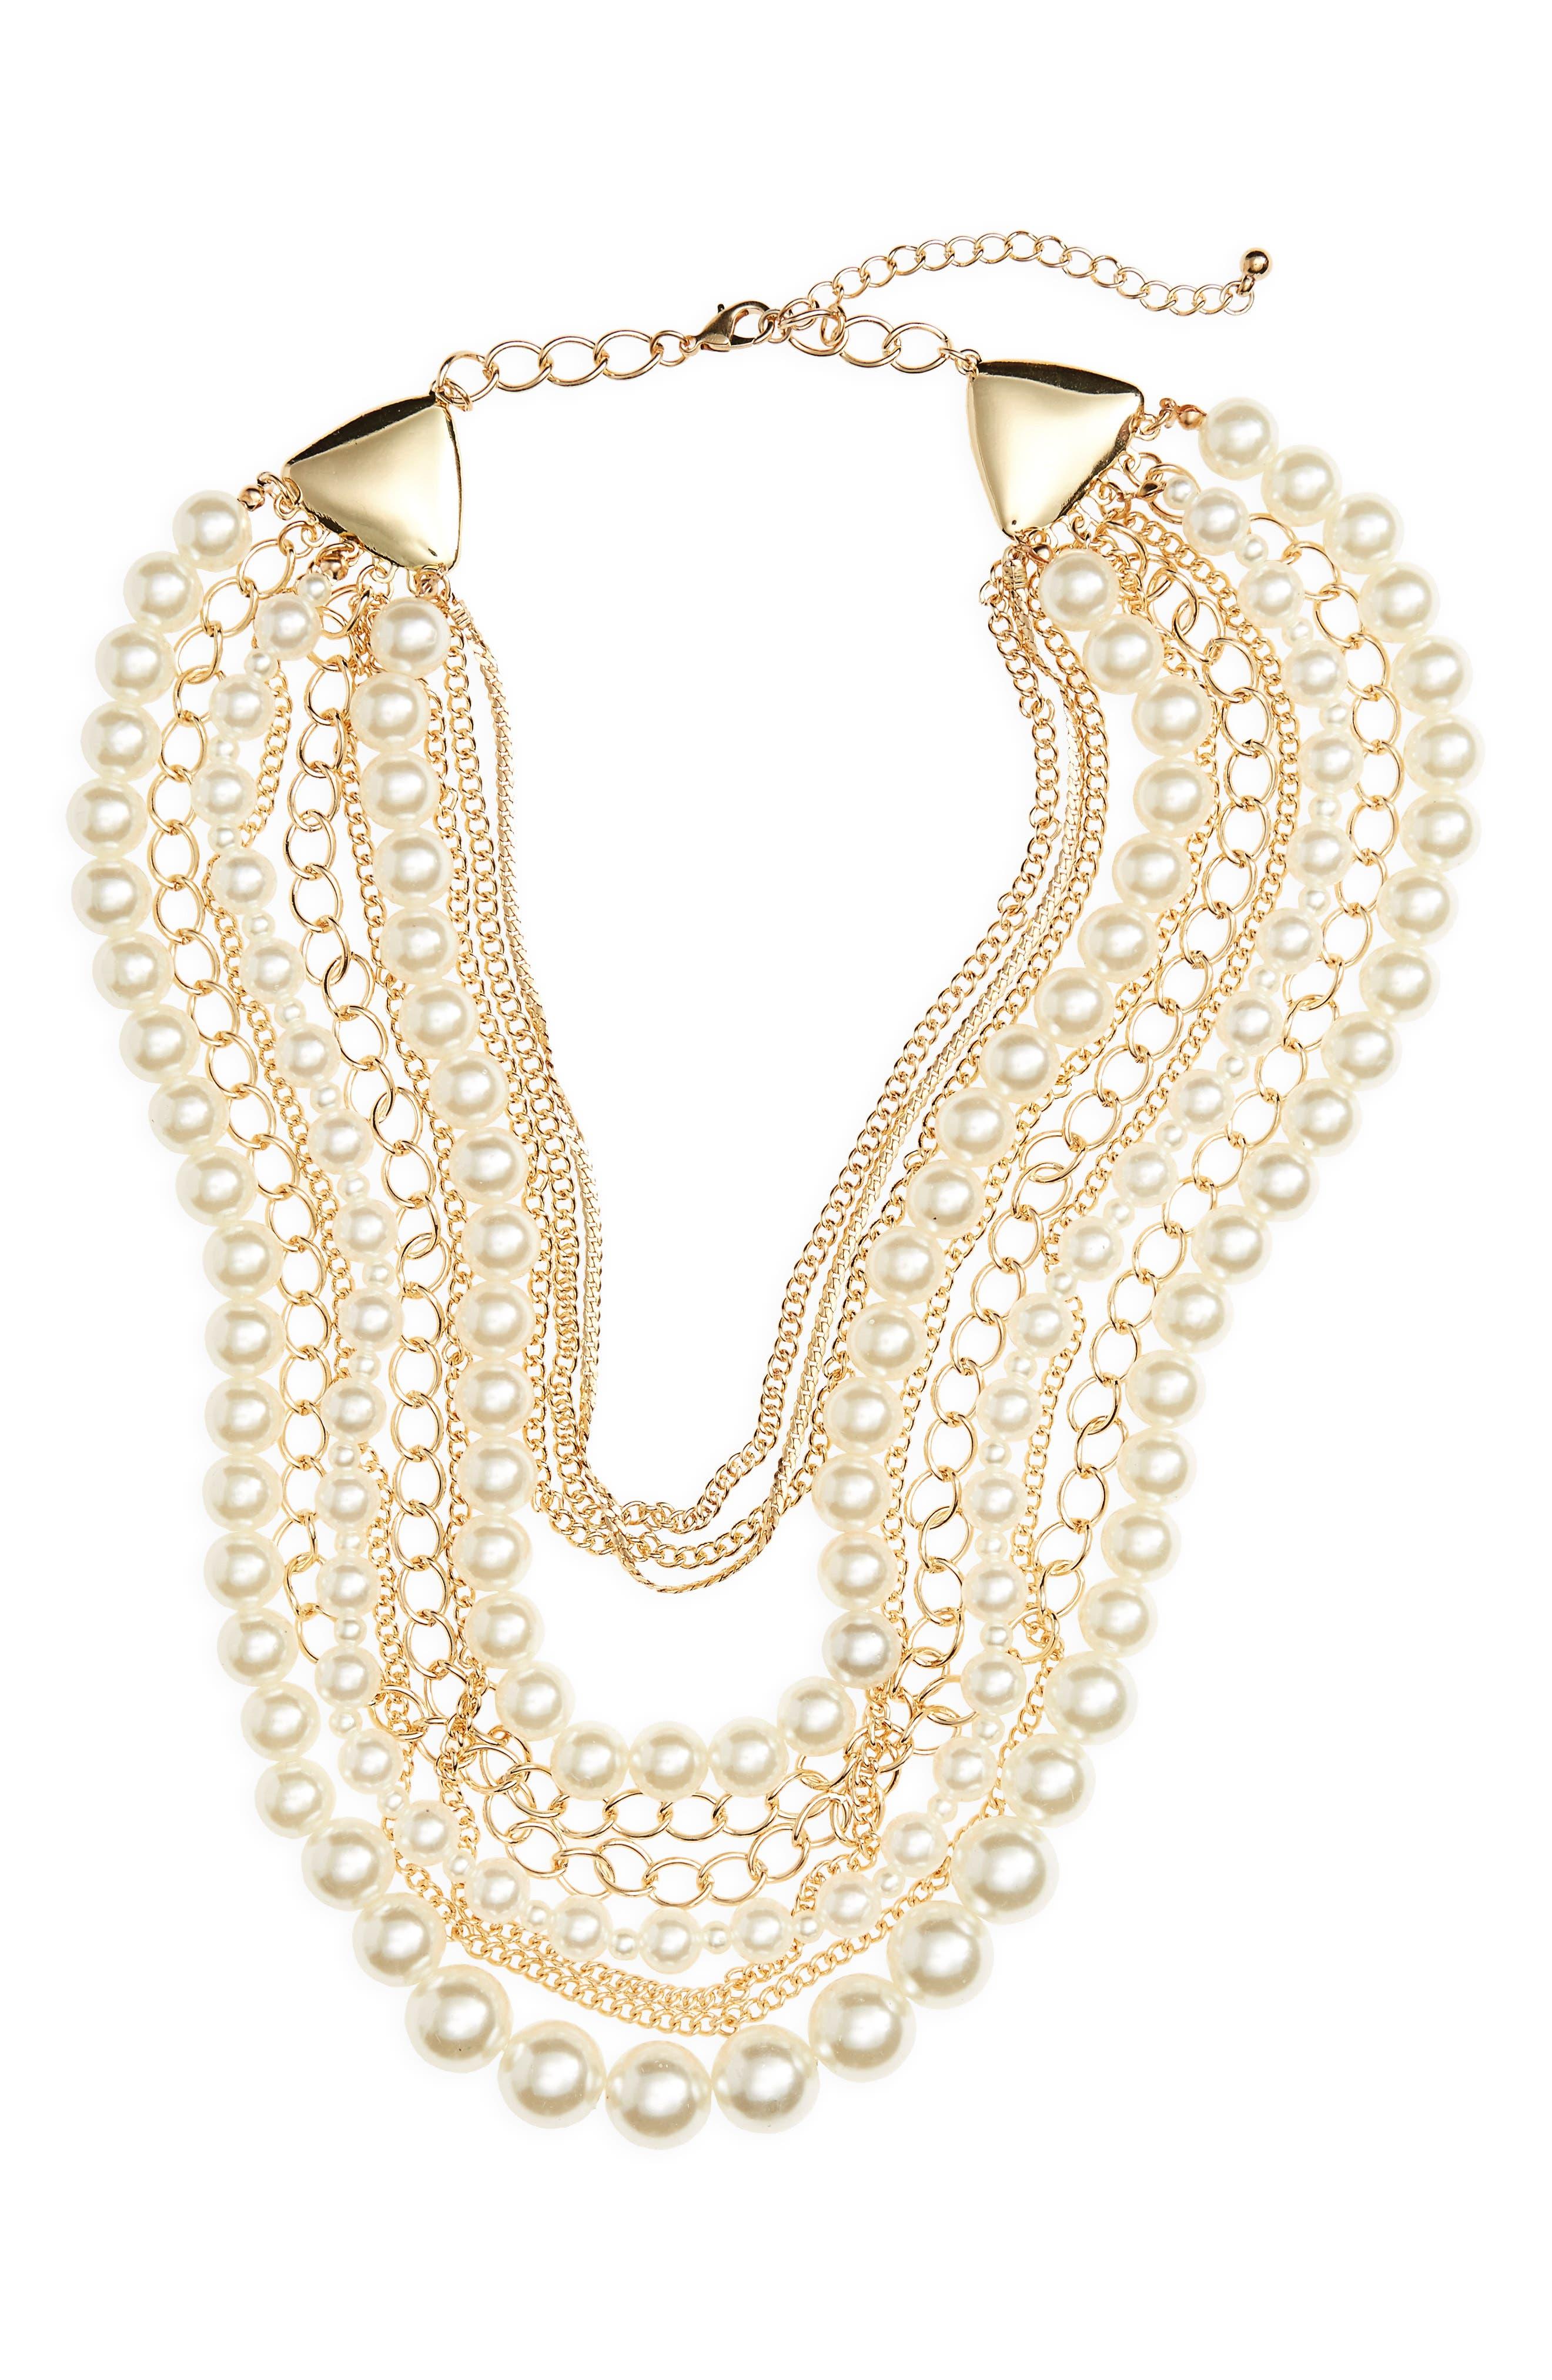 Imitation Pearl Chain Necklace,                             Main thumbnail 1, color,